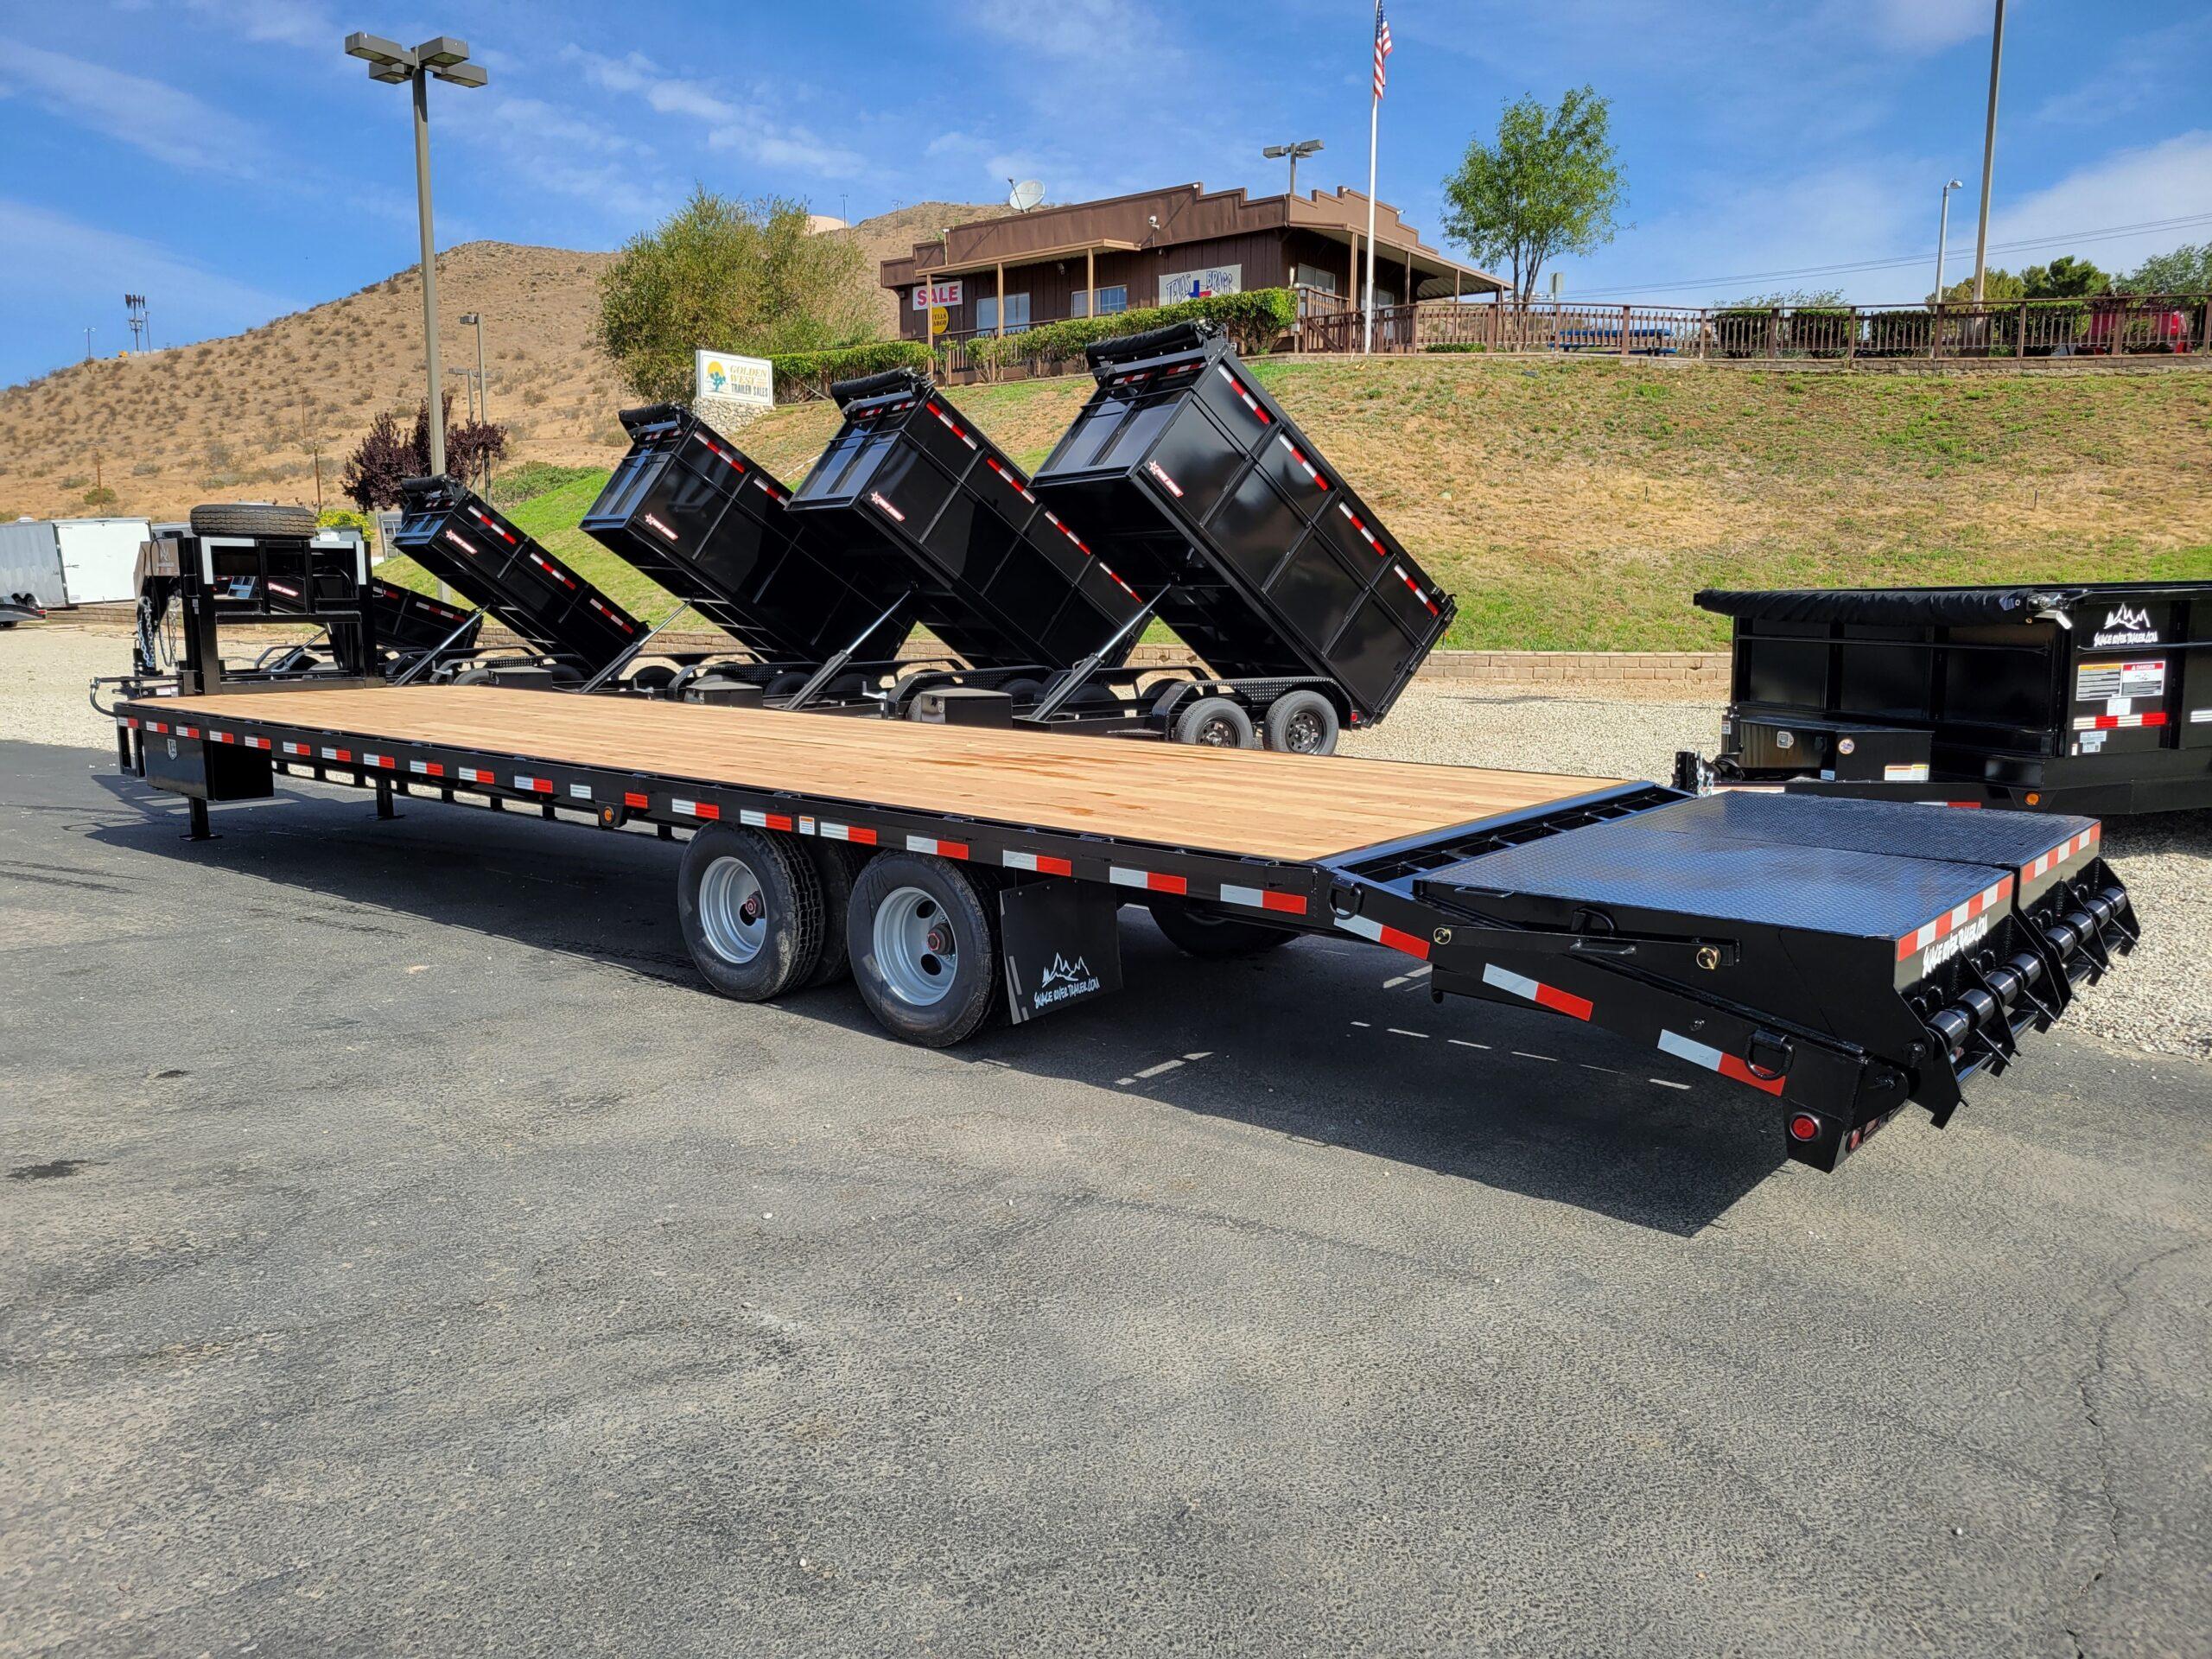 Snake River 8.5x35G/N AllRamp 24K - Driver side rear 3/4 view